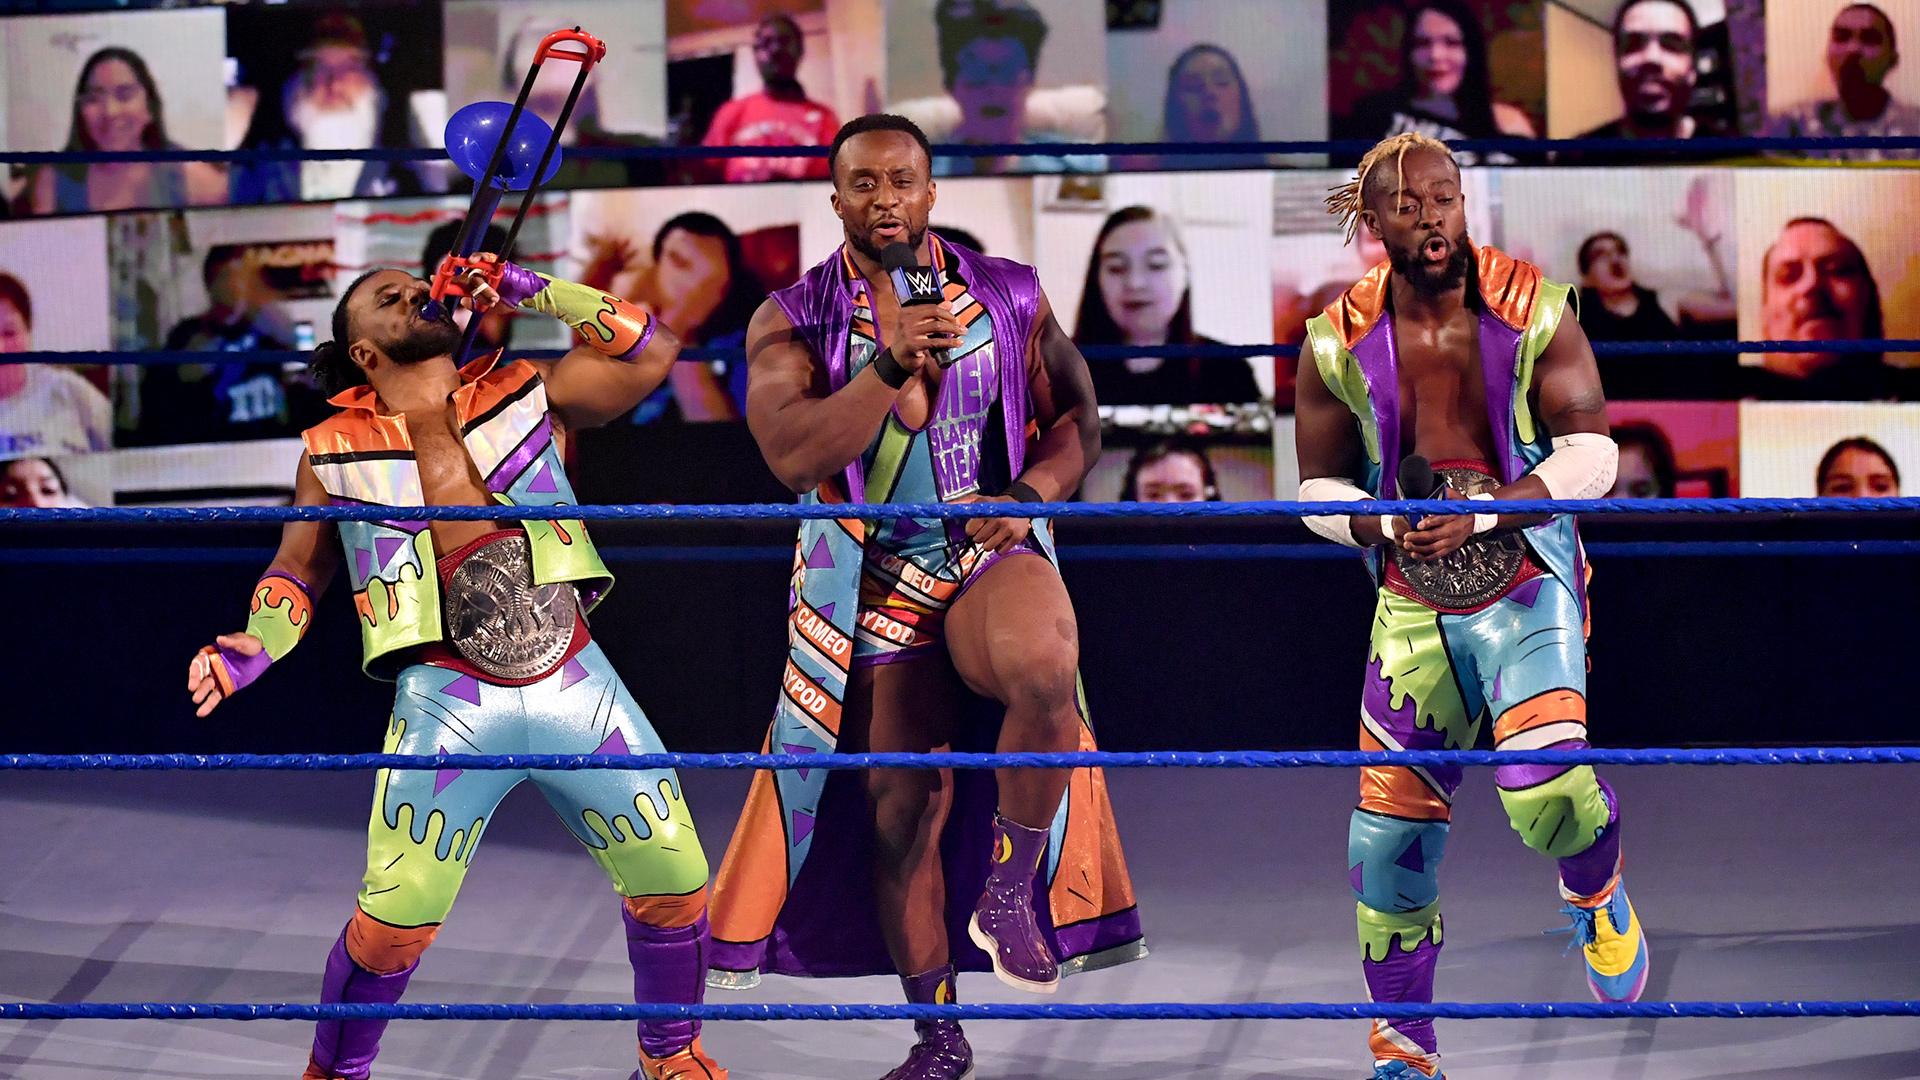 New Day vencem combate de despedida no Friday Night SmackDown